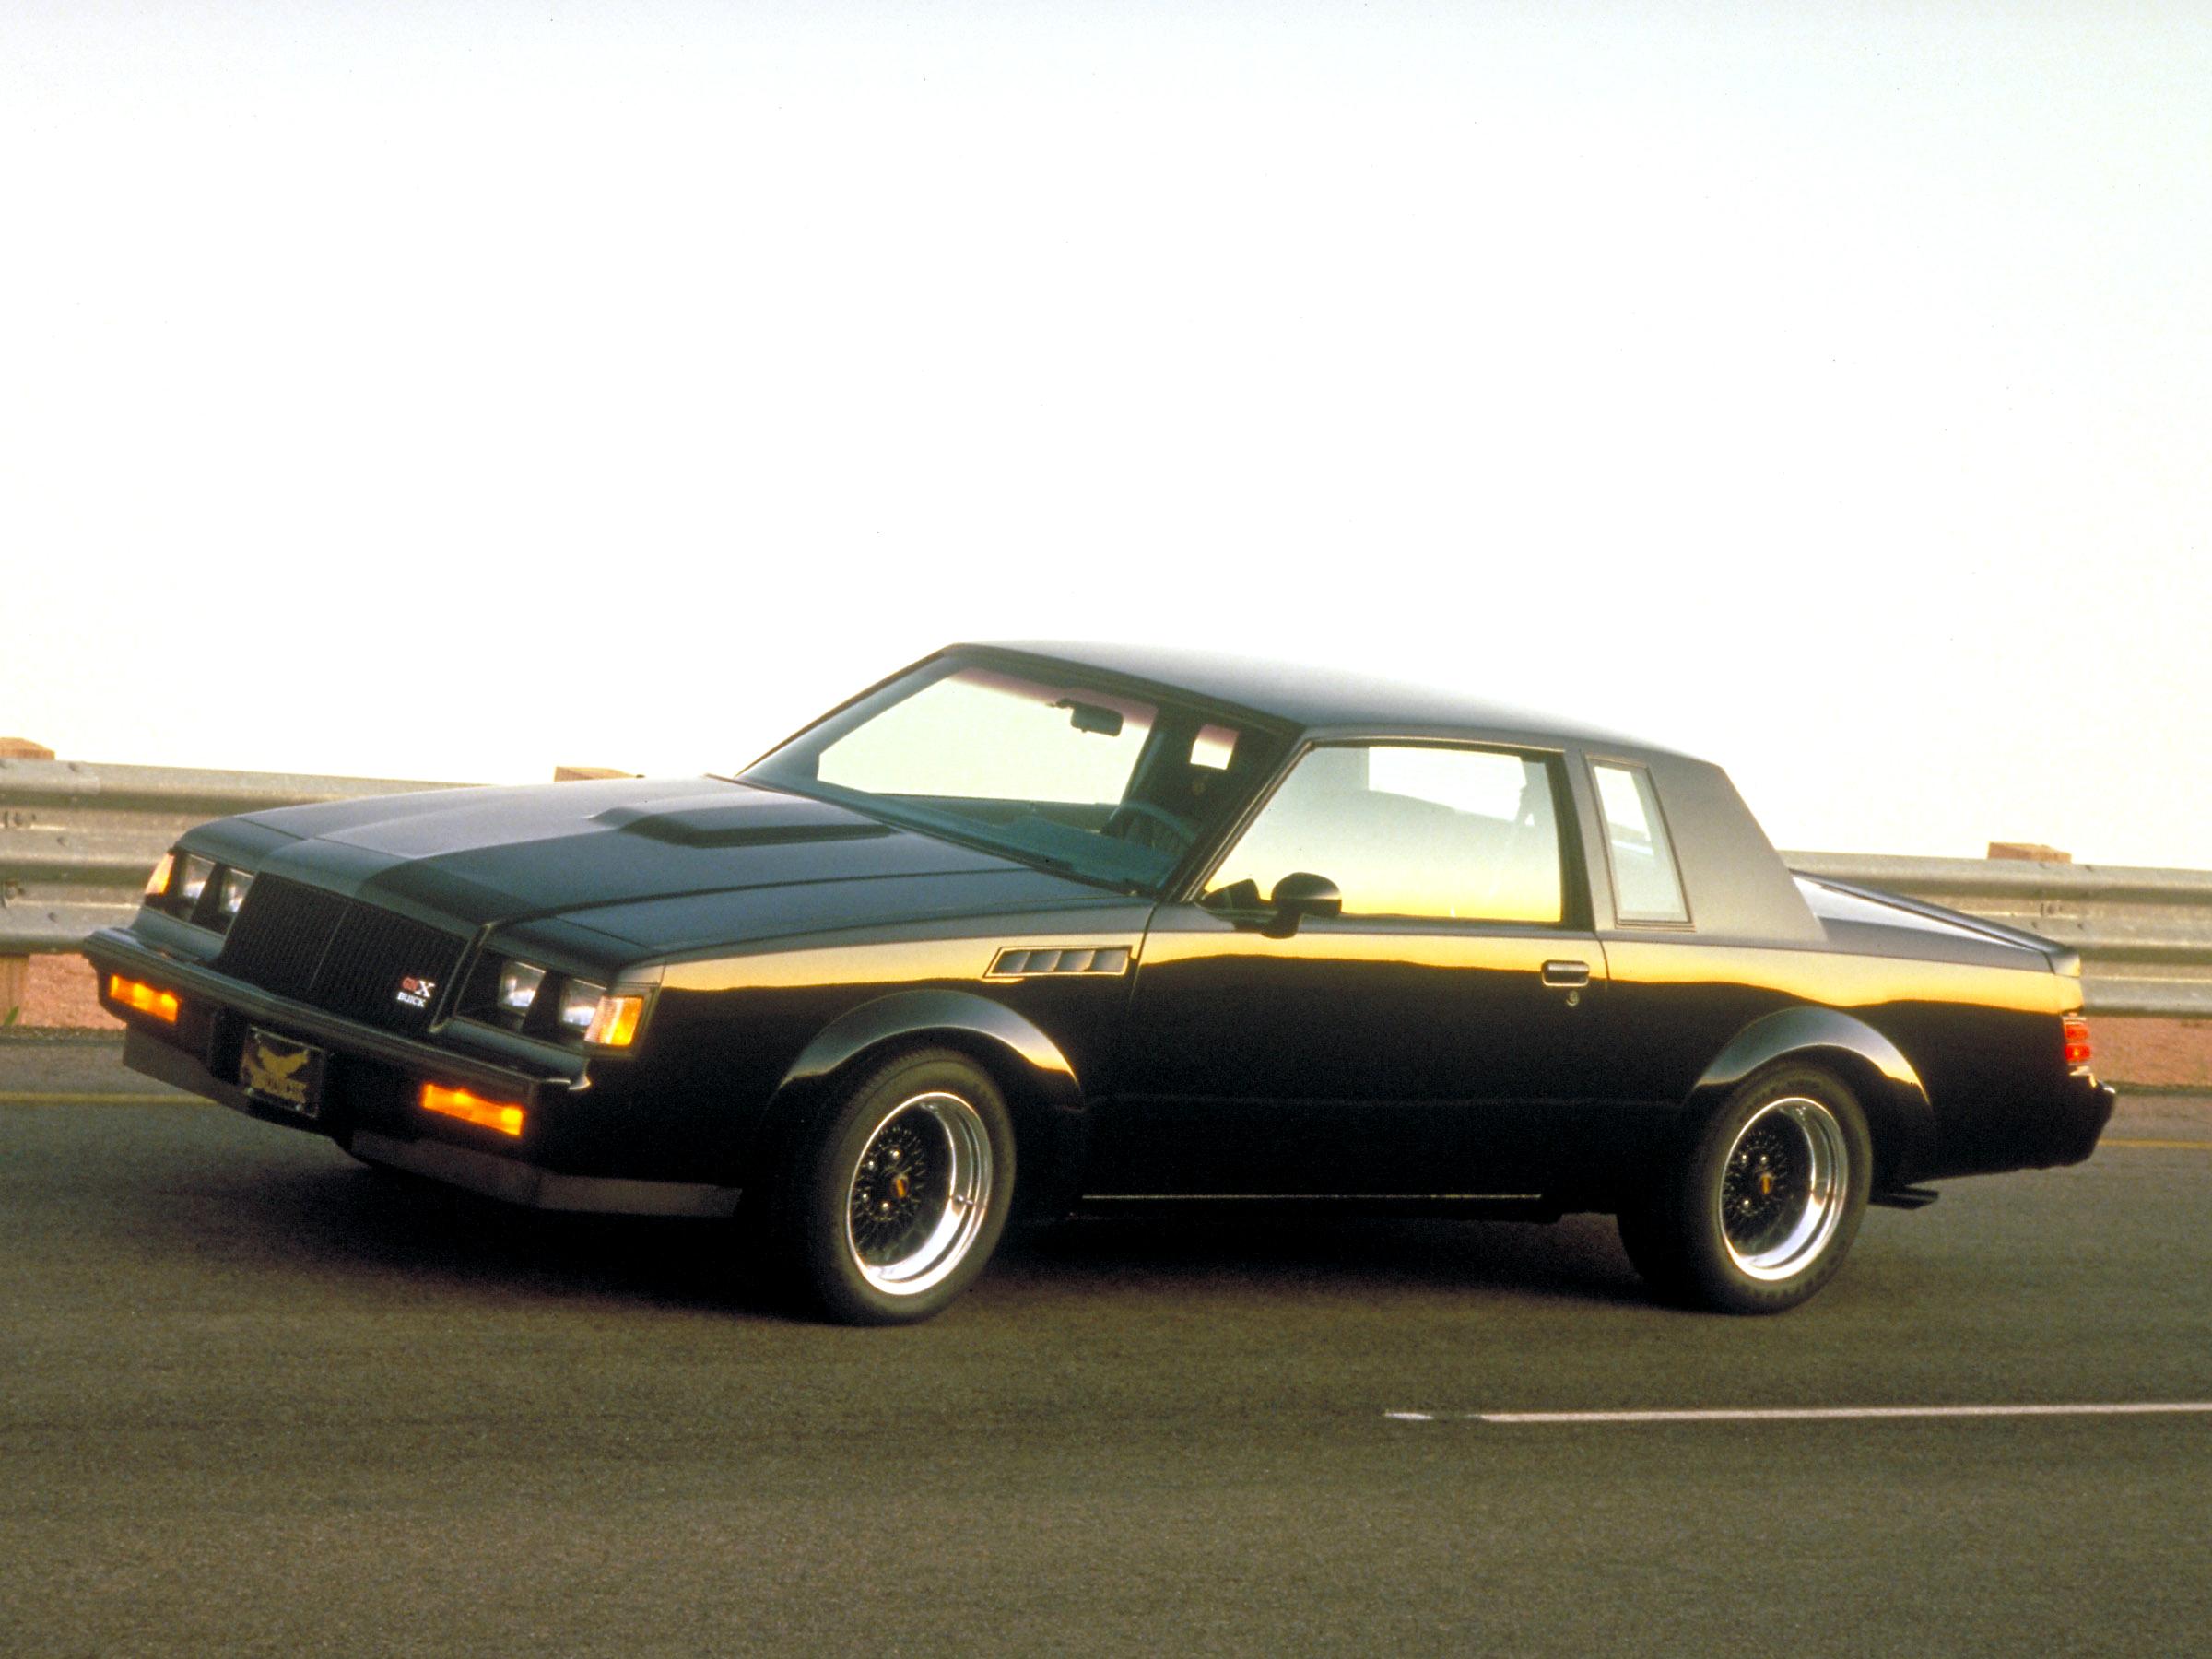 1984 Buick Grand National Wiring Diagram 1987 Buick Regal Grand